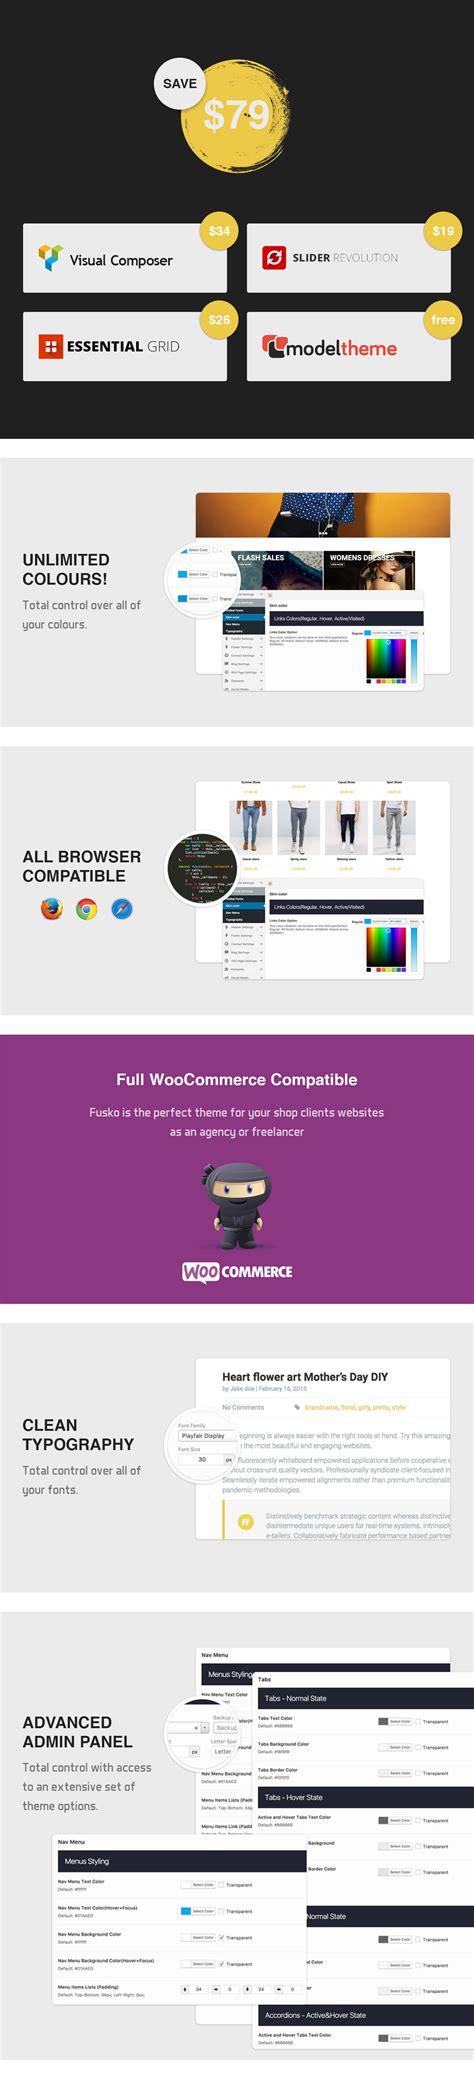 fusko v1 2 tech gadgets woocommerce wordpress theme